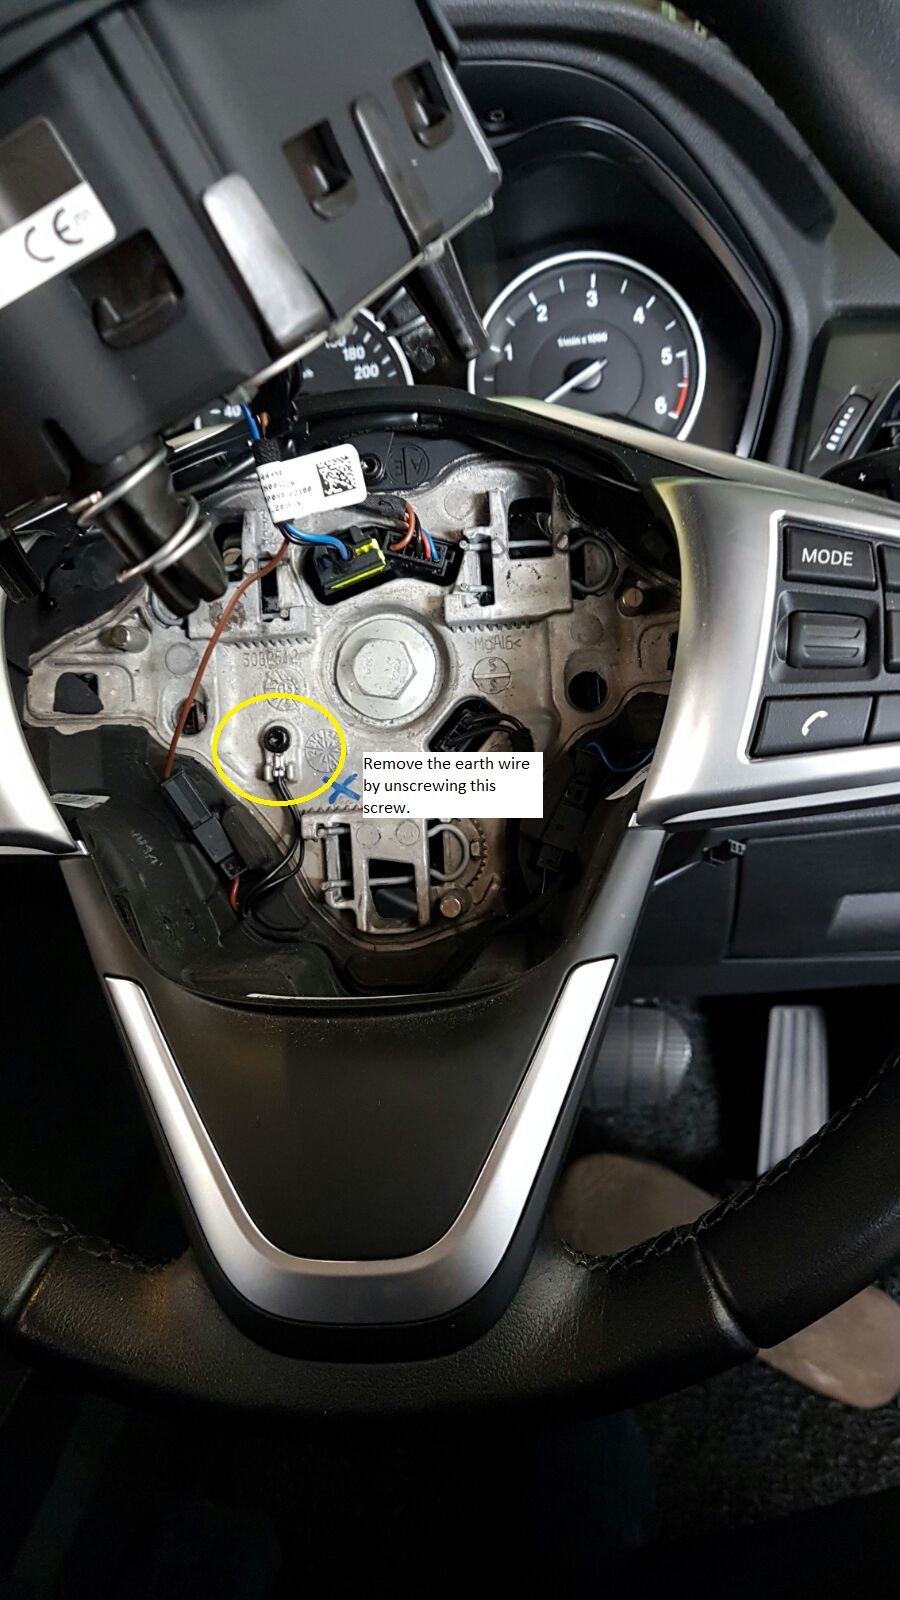 BMW Coding for F45, F46, F48 (Active Tourer / Gran Tourer / X1)